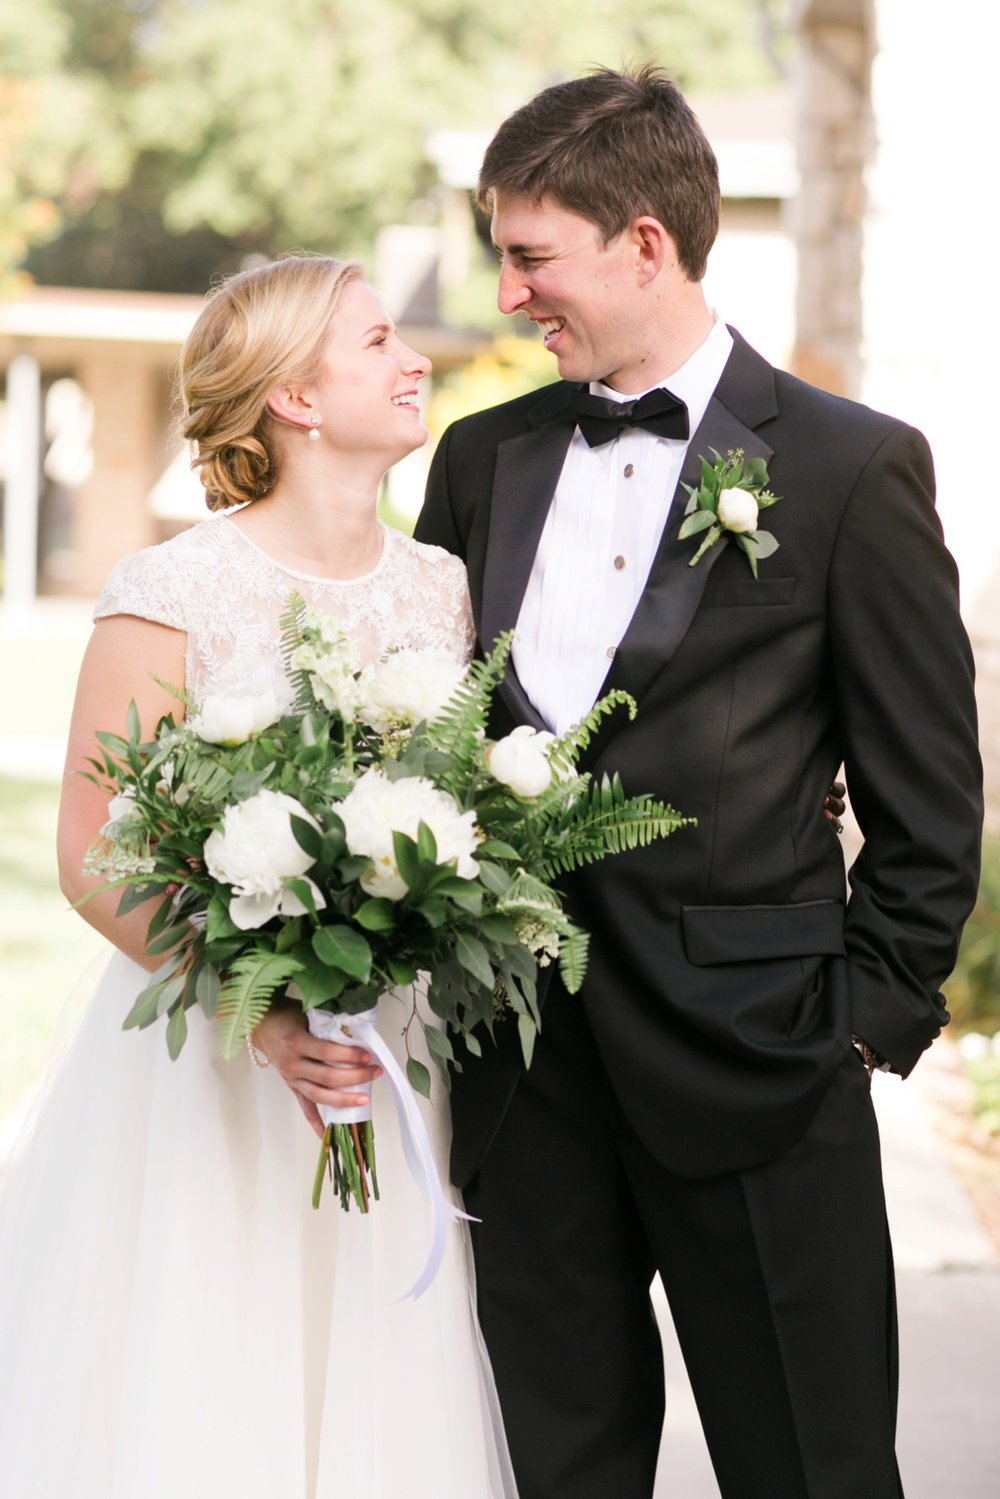 Corpus Christi Bride & Groom simply elegant I Chandras Collection Photography l www.avenueievents.com.jpg